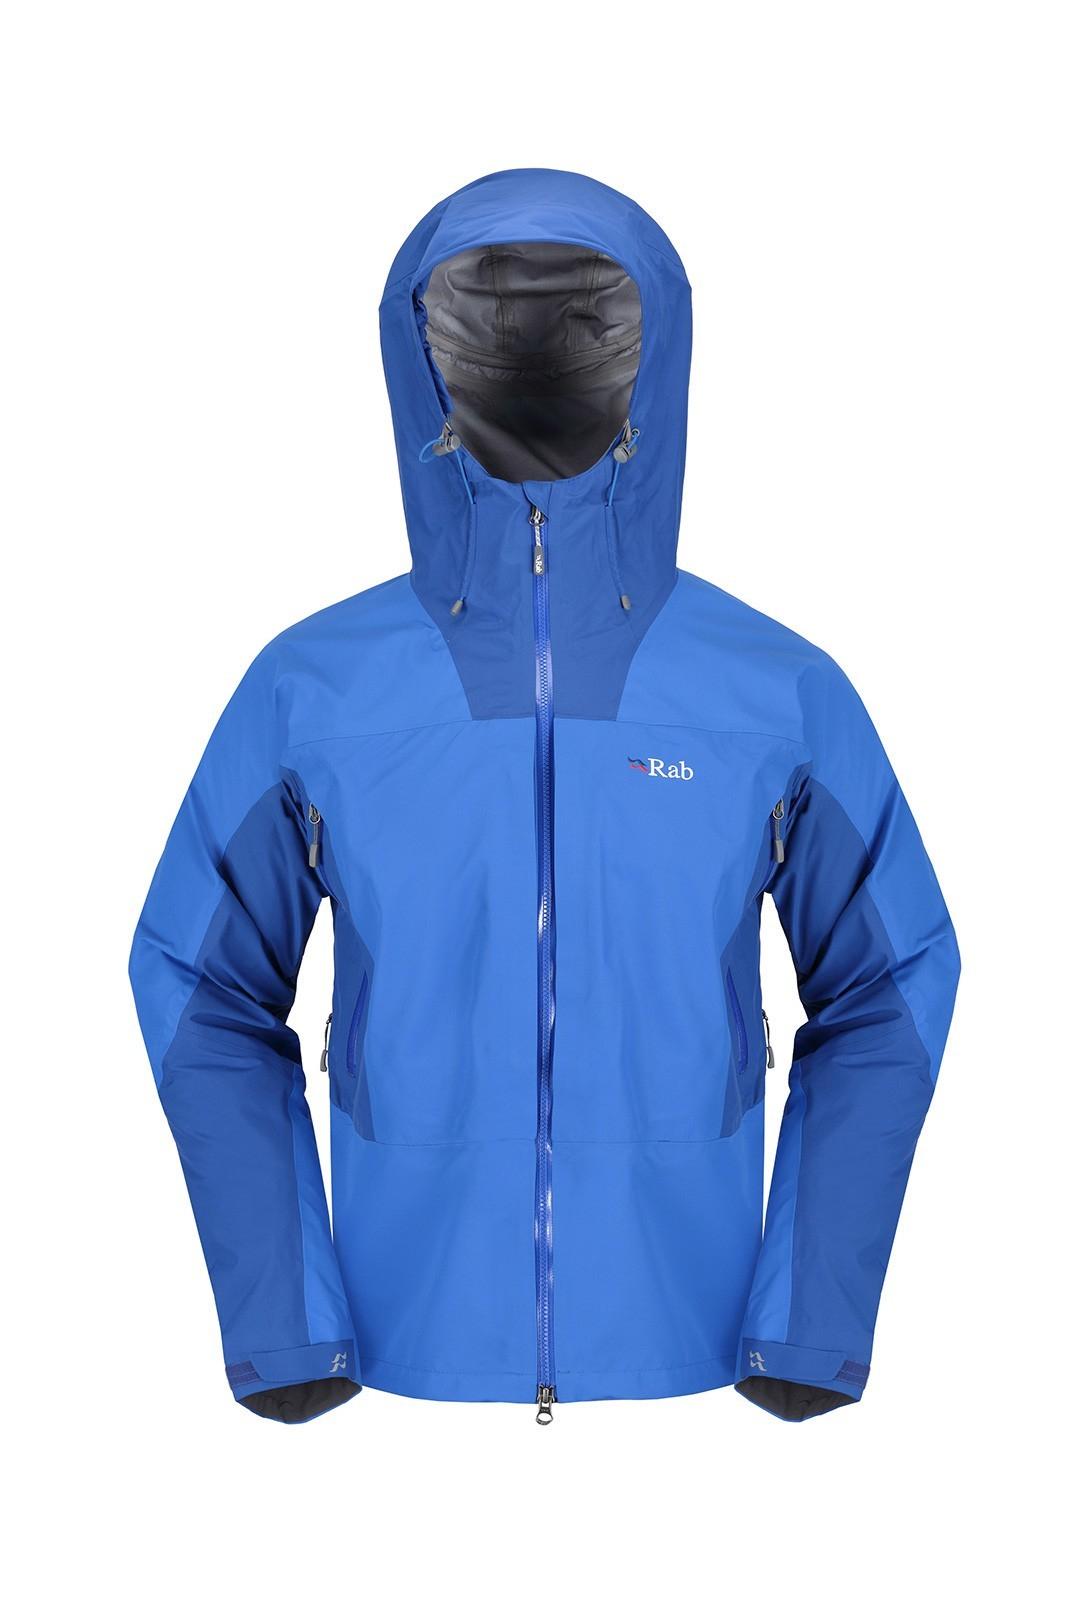 Rab Latok Mens Jacket (S & XXL) reduced £350 to £150 @ GoOutdoors